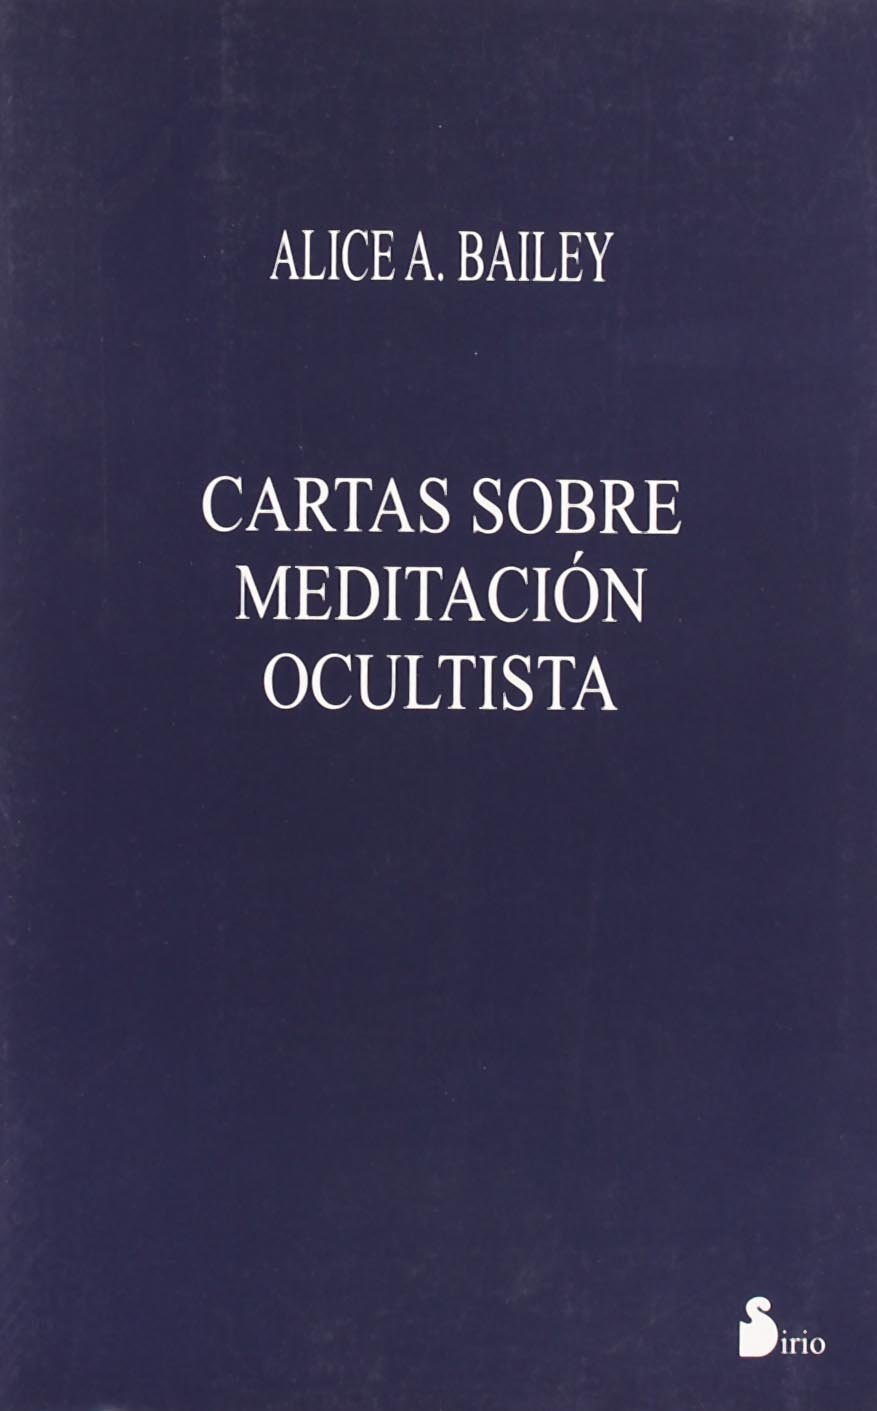 CARTAS SOBRE MEDITACION OCULTISTA (Rustica) (2002) Tapa blanda – 18 oct 2002 ALICE BAILEY Editorial Sirio 8478083170 699860